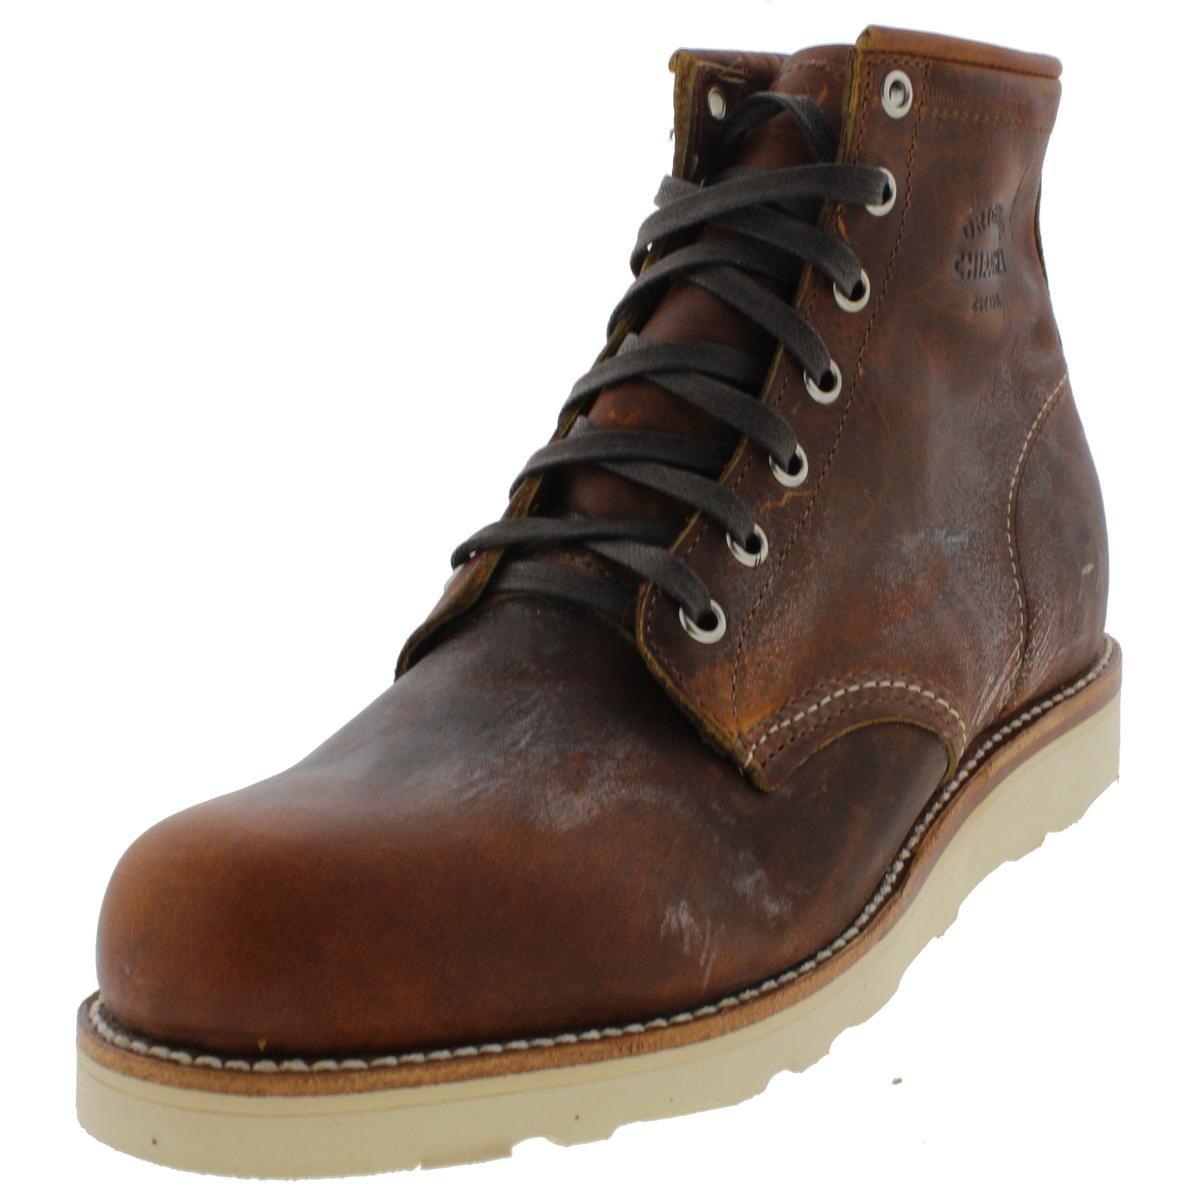 Original Chippewa Collection Men's 1901M17 6 Inch Plain Toe Boot, Tan Renegade, 8.5 D US